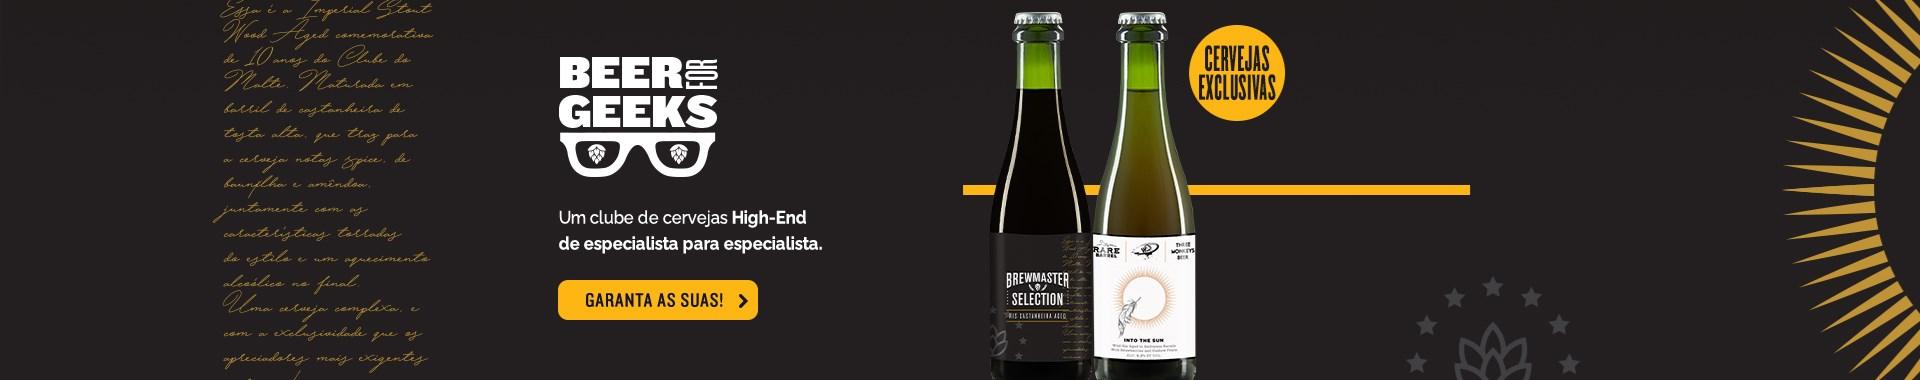 Beer For Geeks Março - Banner Home Desktop